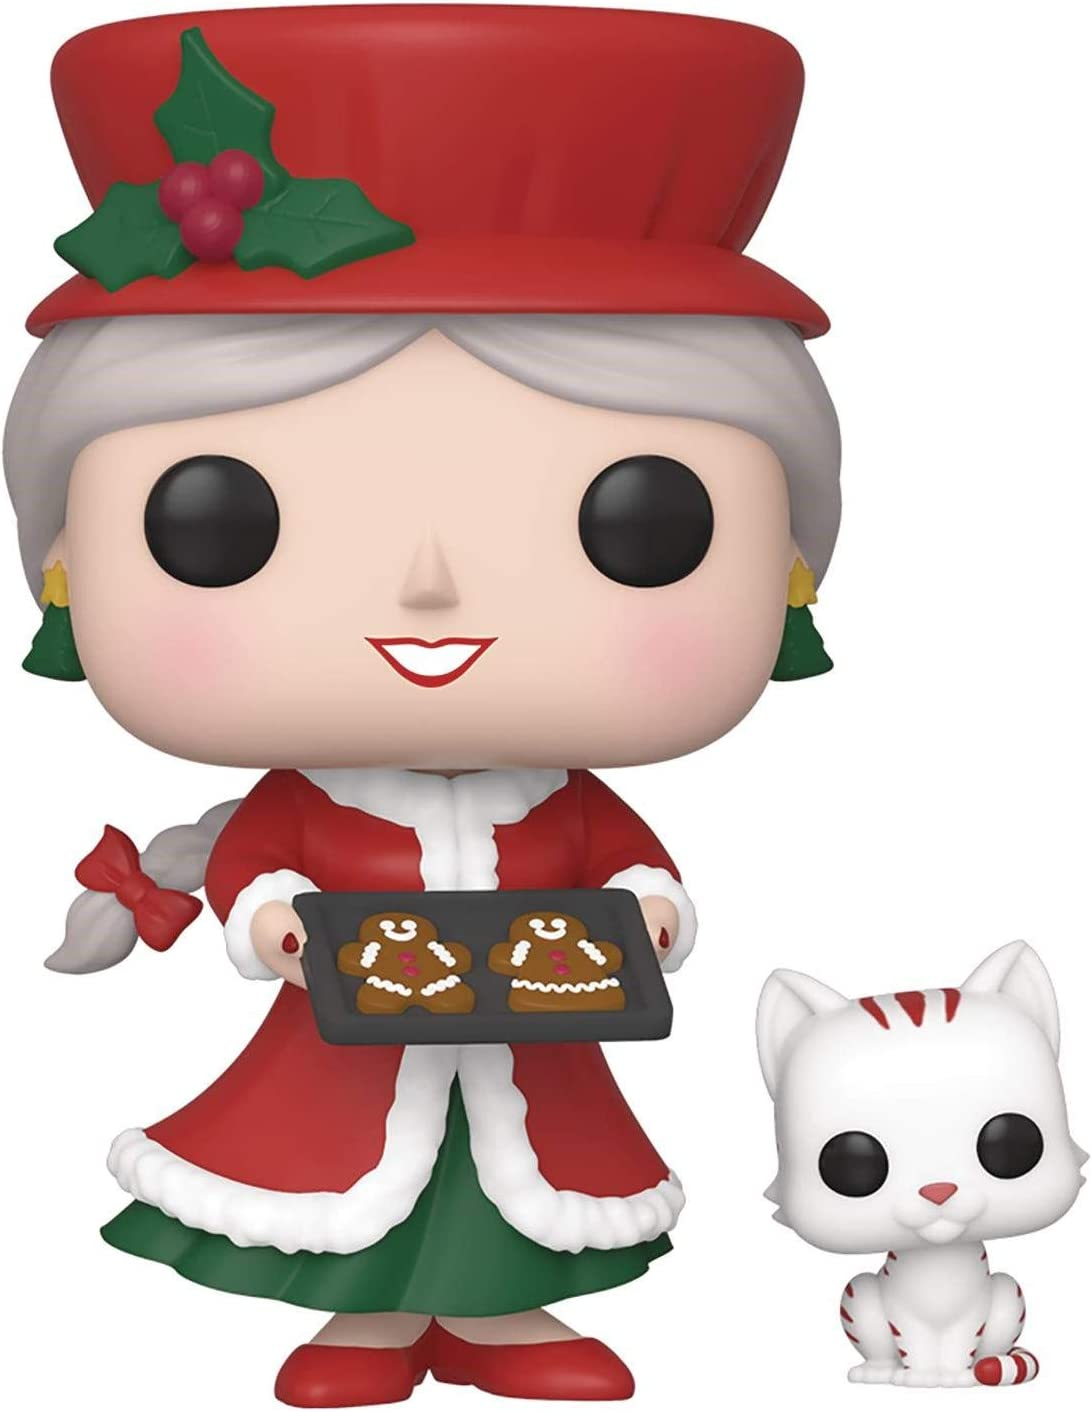 Vinyl Figure Pop Holidays: Peppermint Lane Claus /& Candy Cane Pop Includes Compatible Pop Box Protector Case Mrs